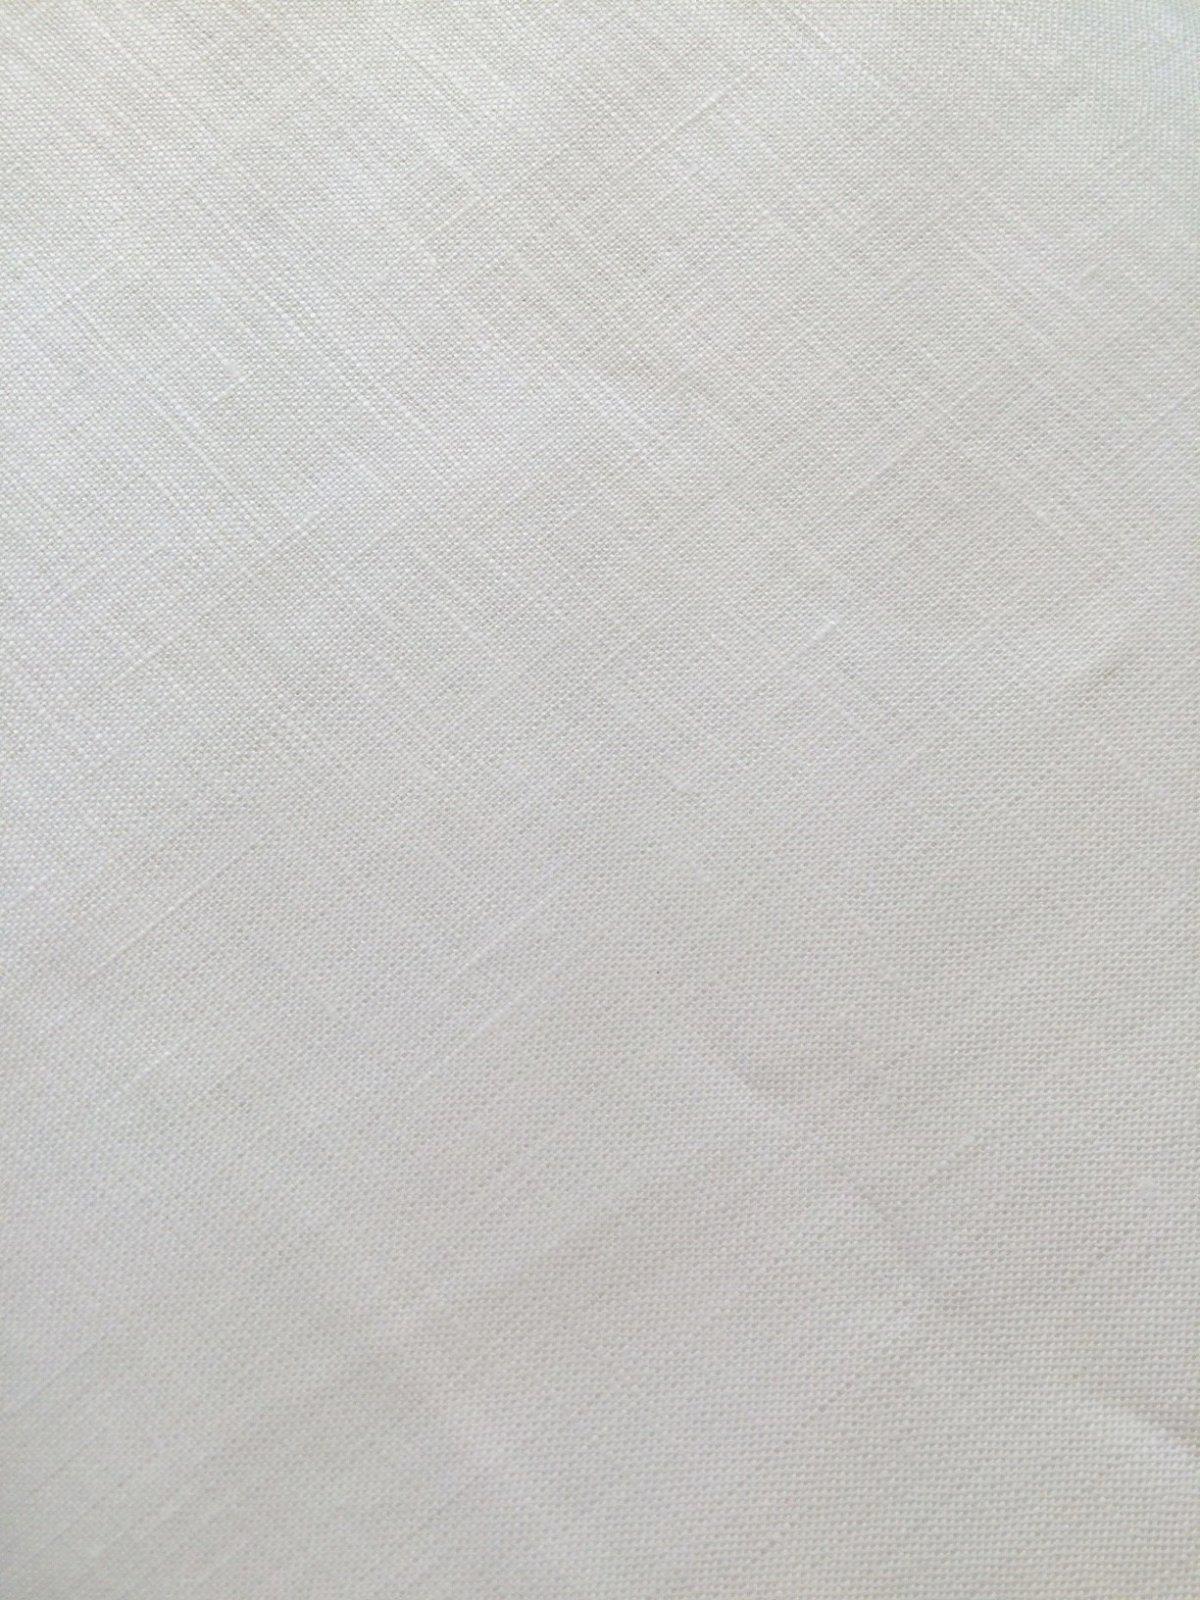 Belfast Best Offwhite Handkerchief Linen